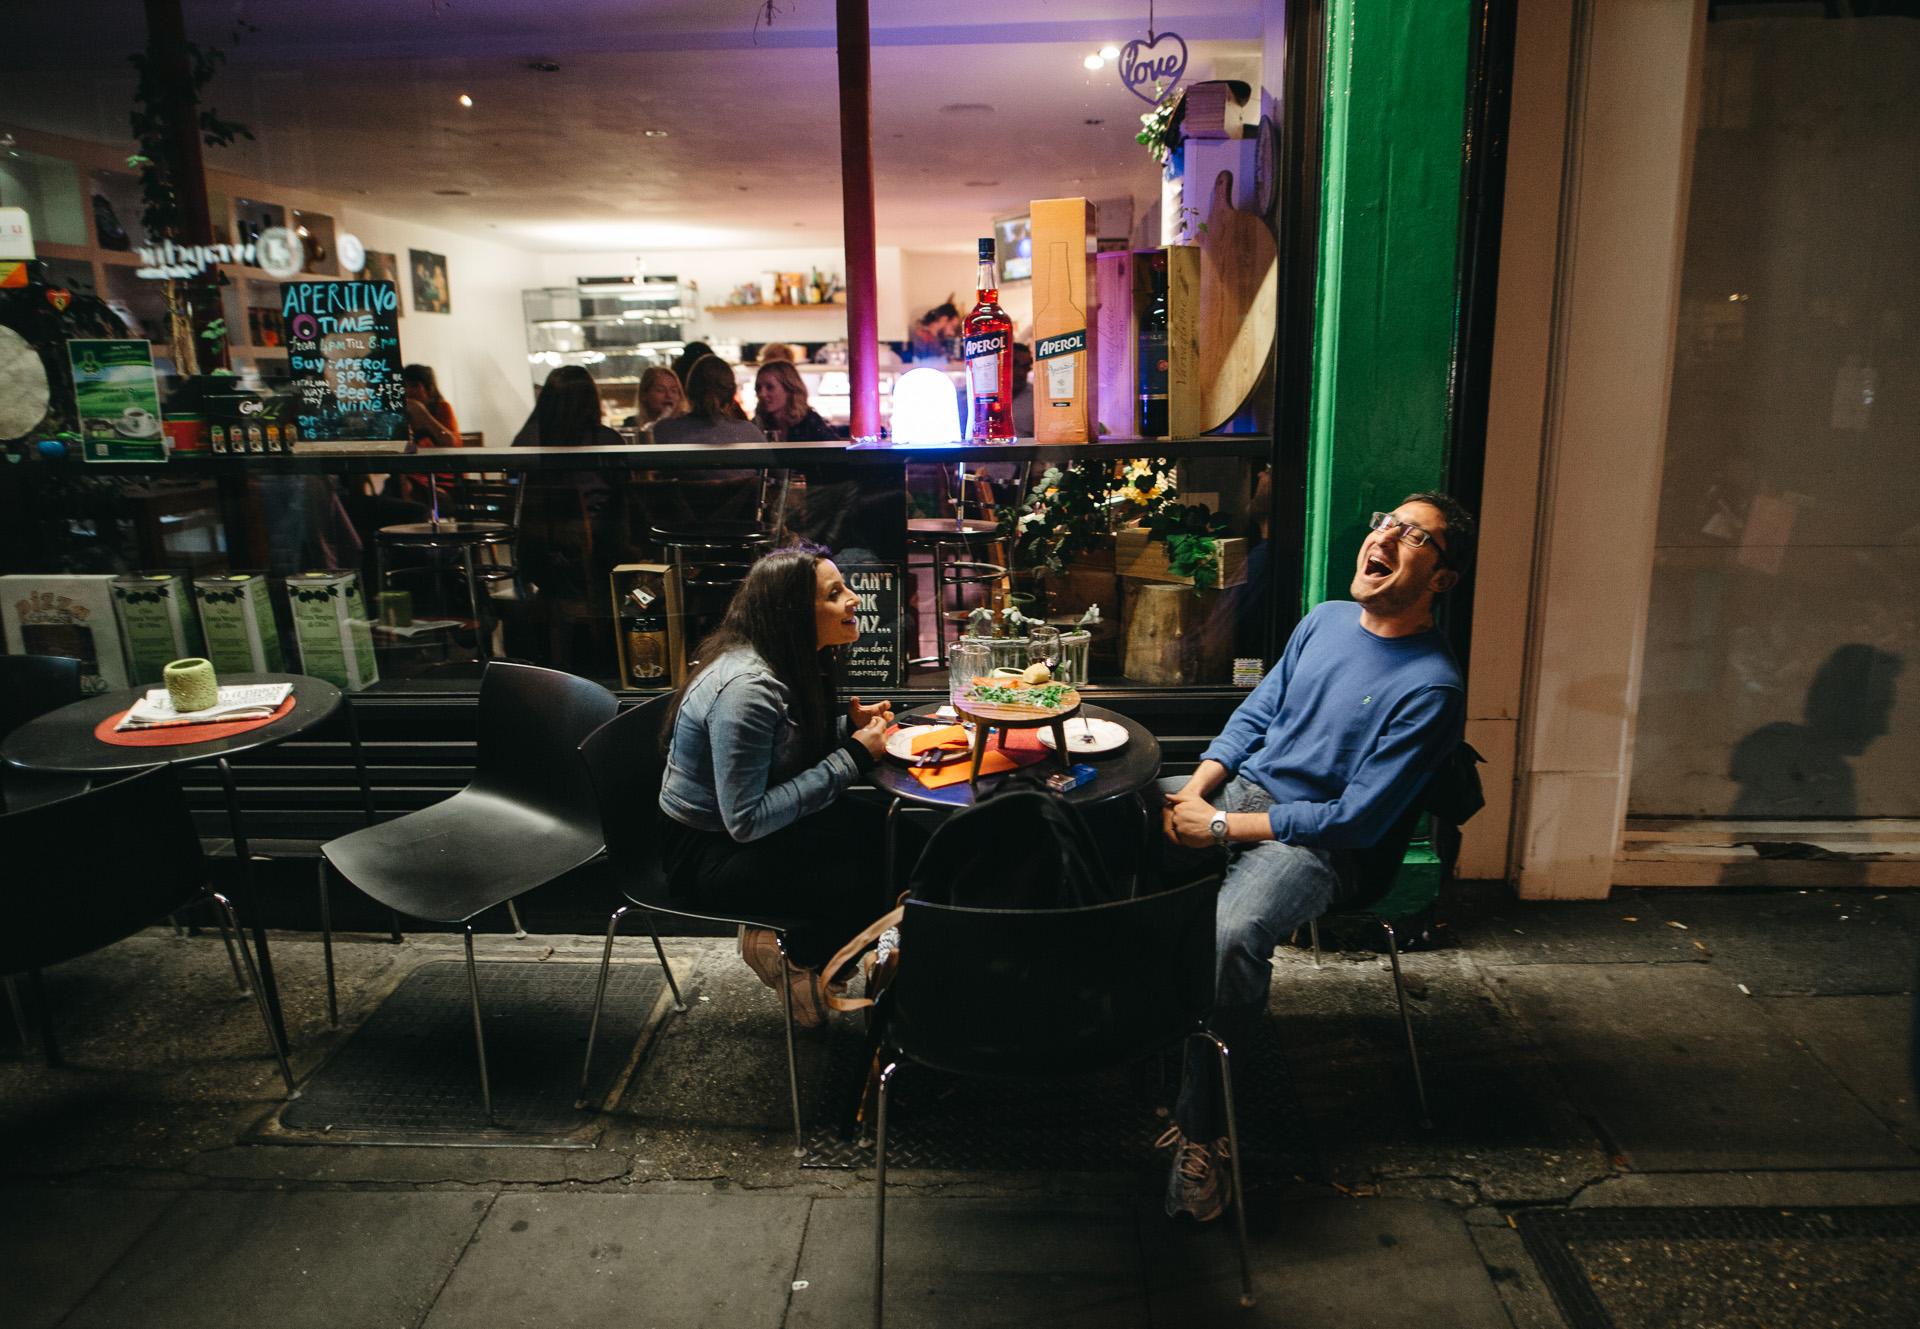 gabor_lenart_london_photographer_street_blogger_lifestyle_img_5092